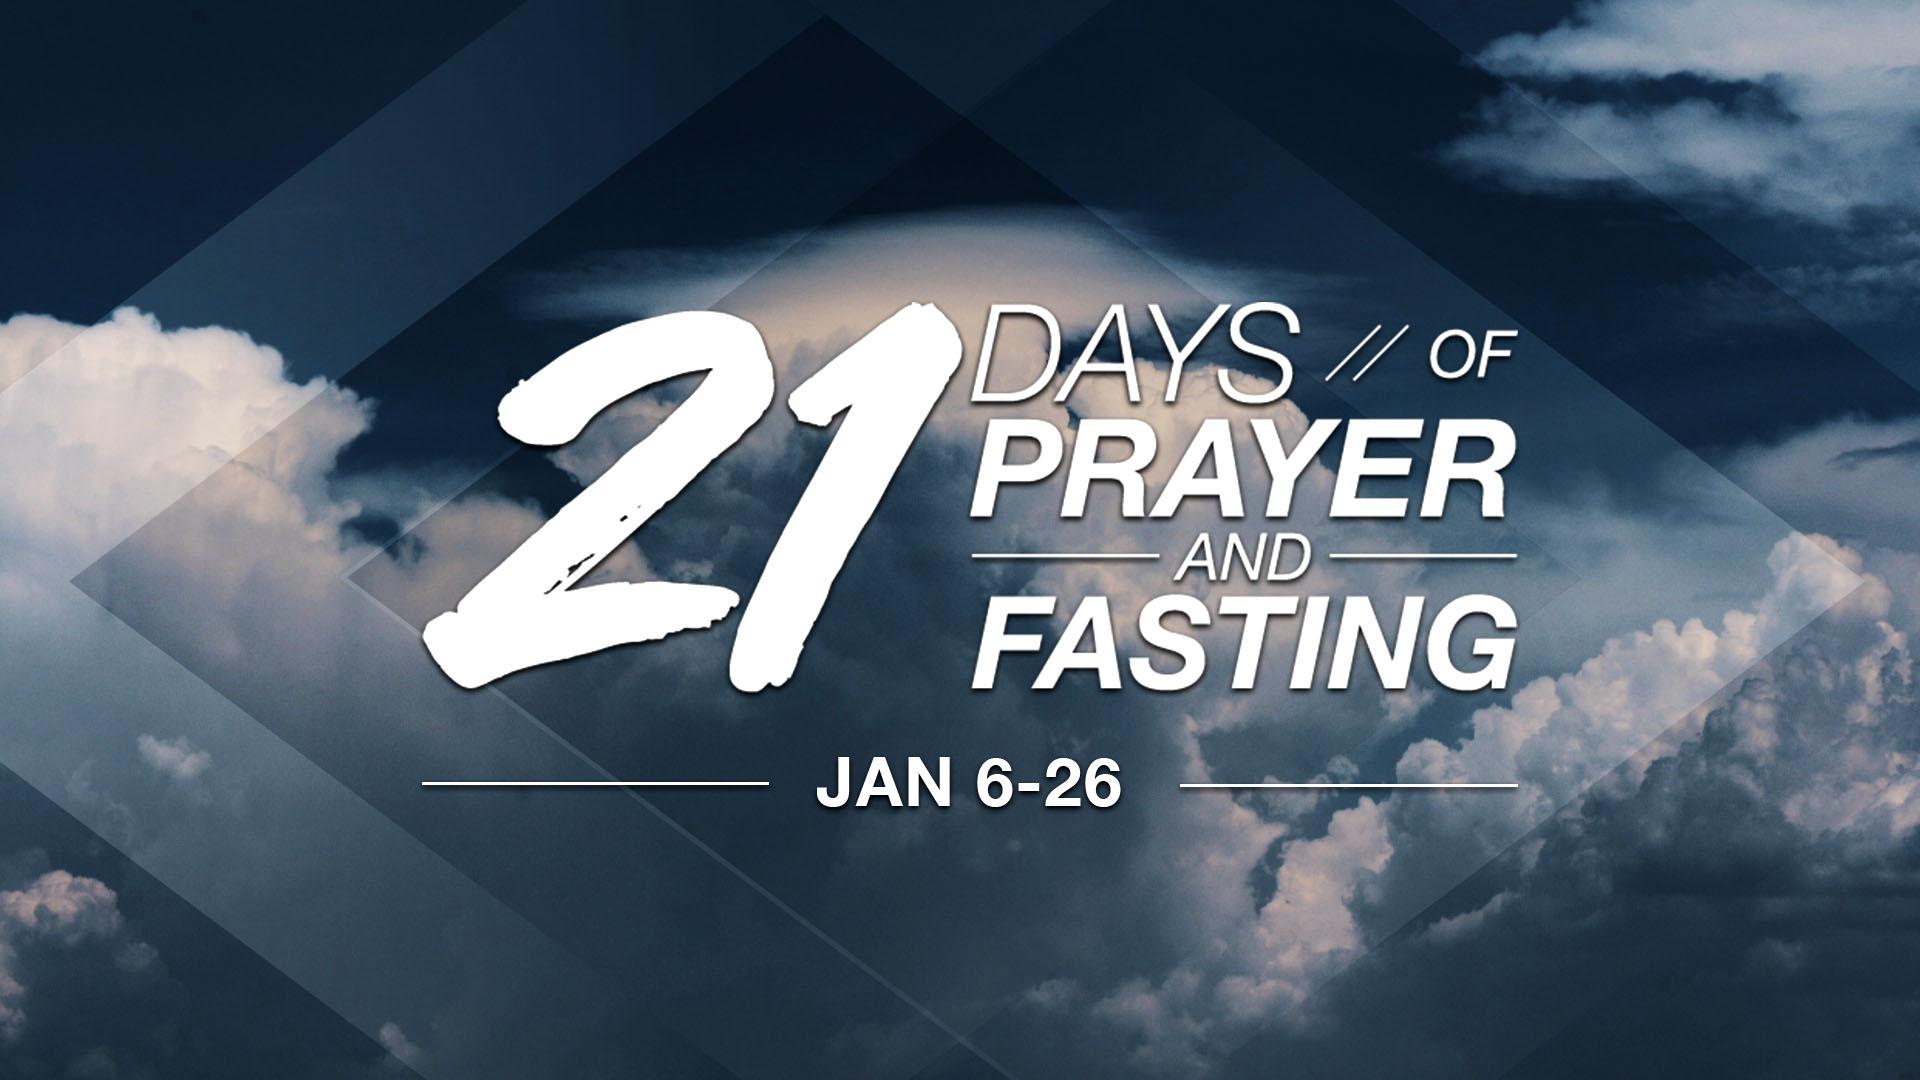 Prayer Cards21 Days of Prayer - Clouds